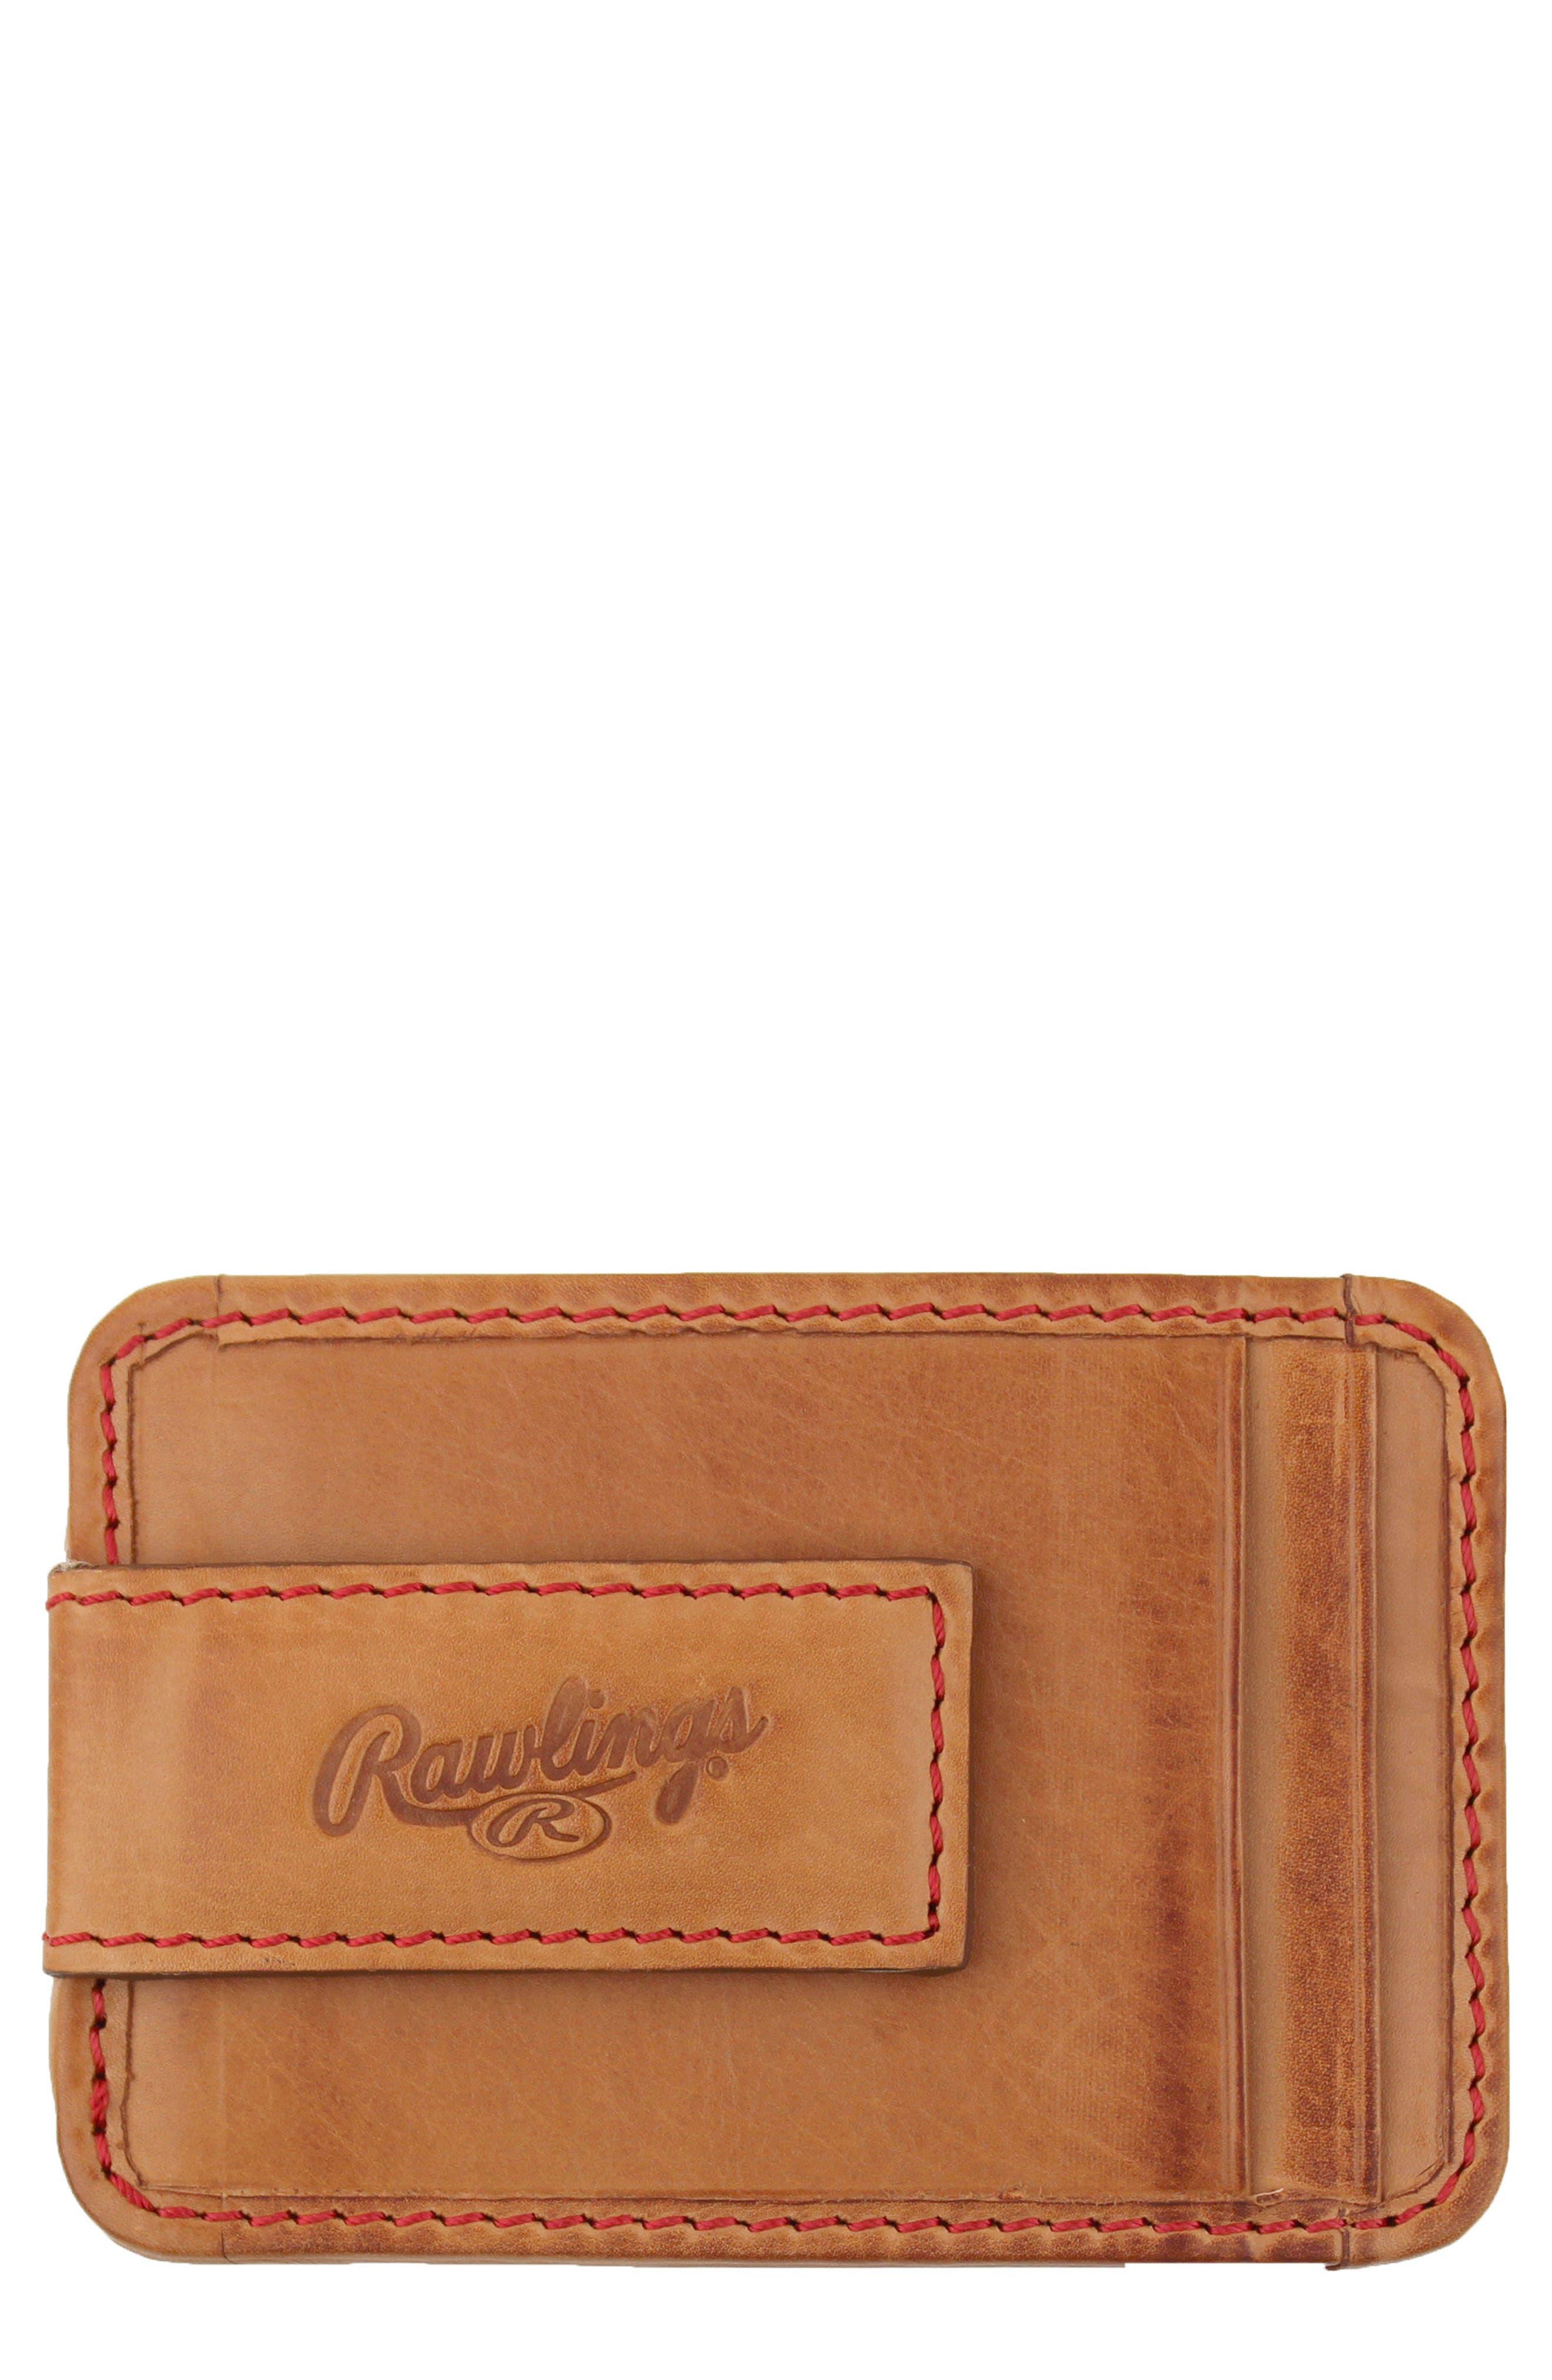 Rawlings Baseball Stitch Money Clip Card Case